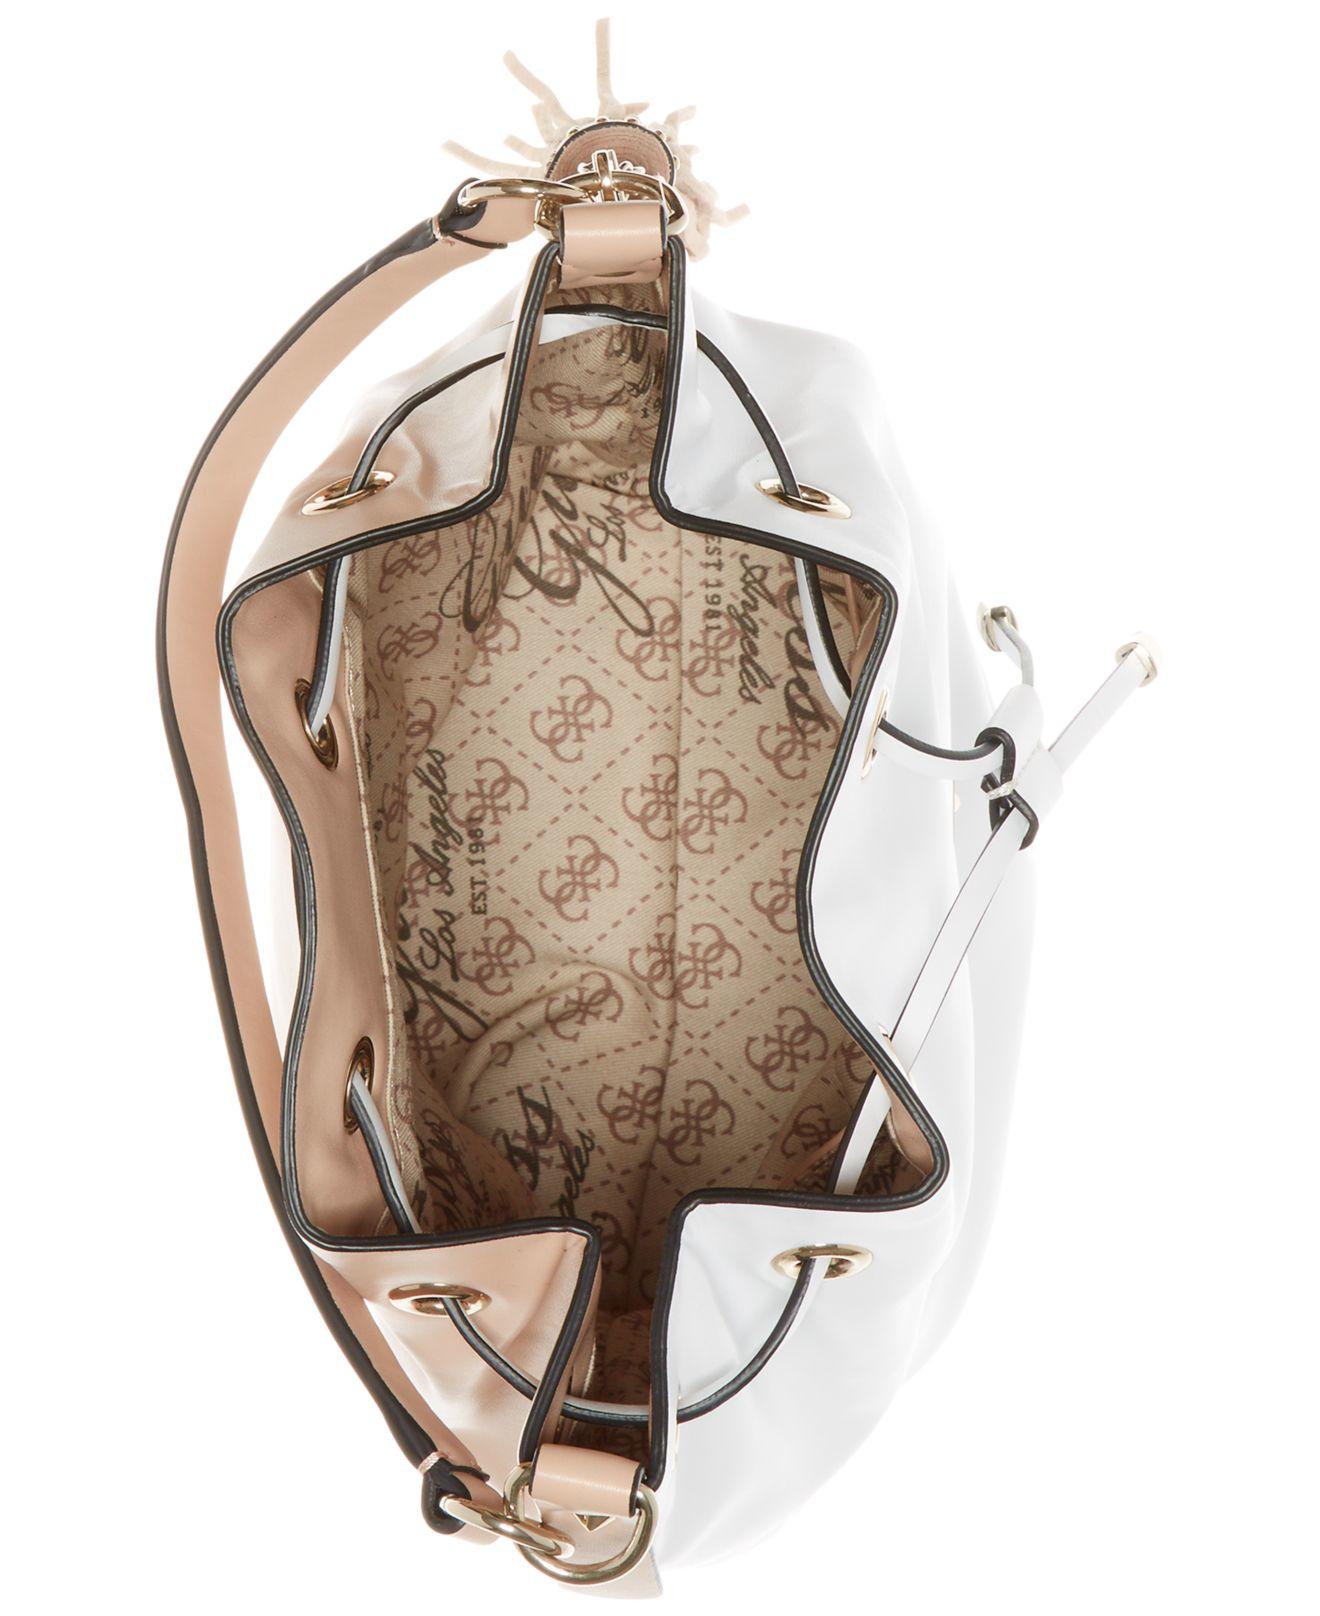 b1b94760ed Lyst - Guess Thompson Drawstring Bucket Bag in White